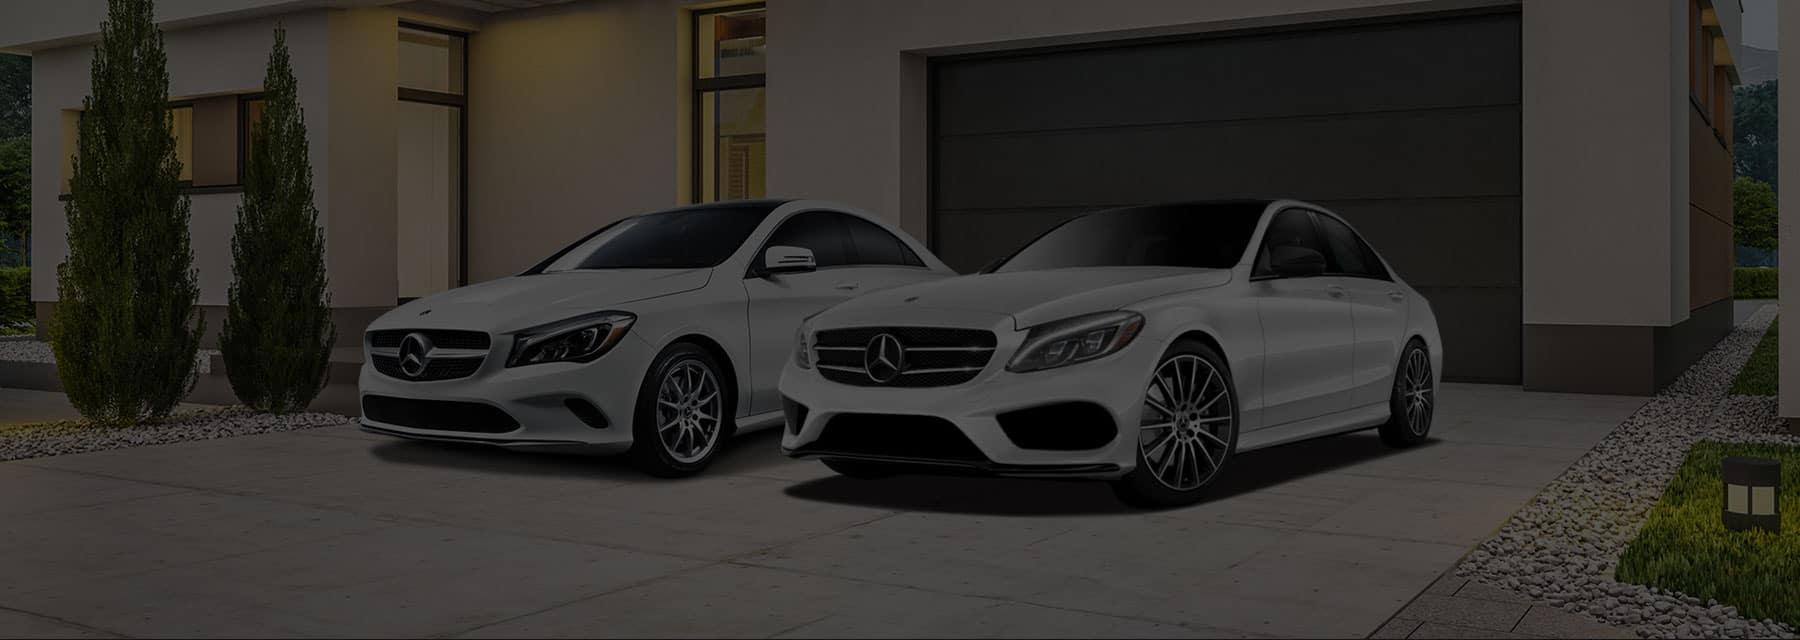 Mercedes Benz Vancouver